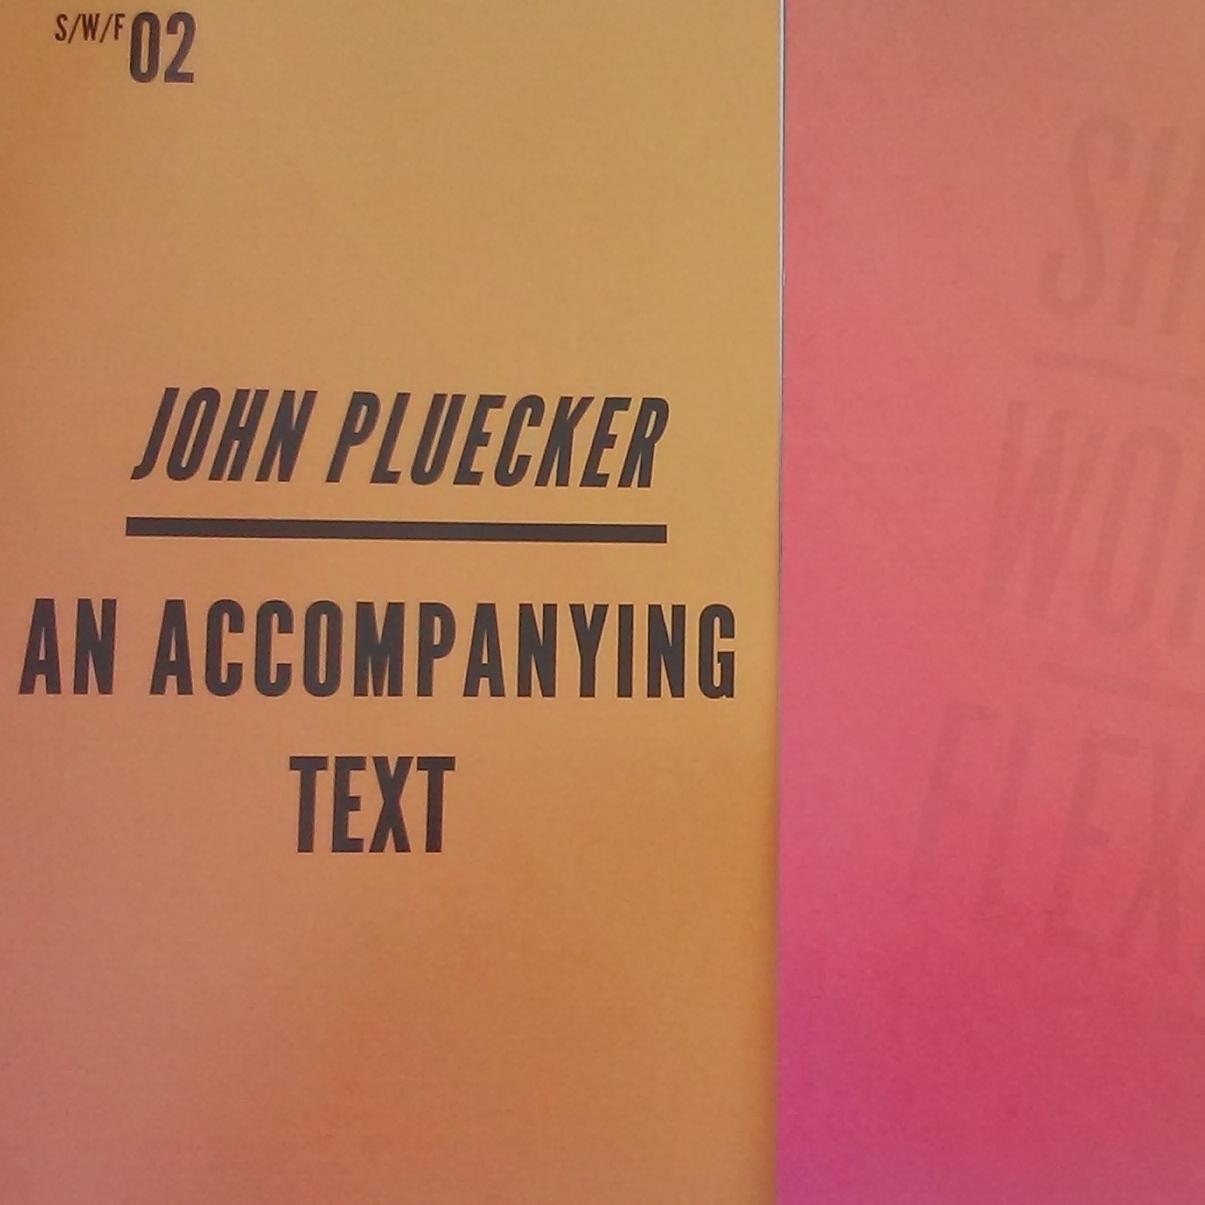 An Accompanying Text Image.jpg